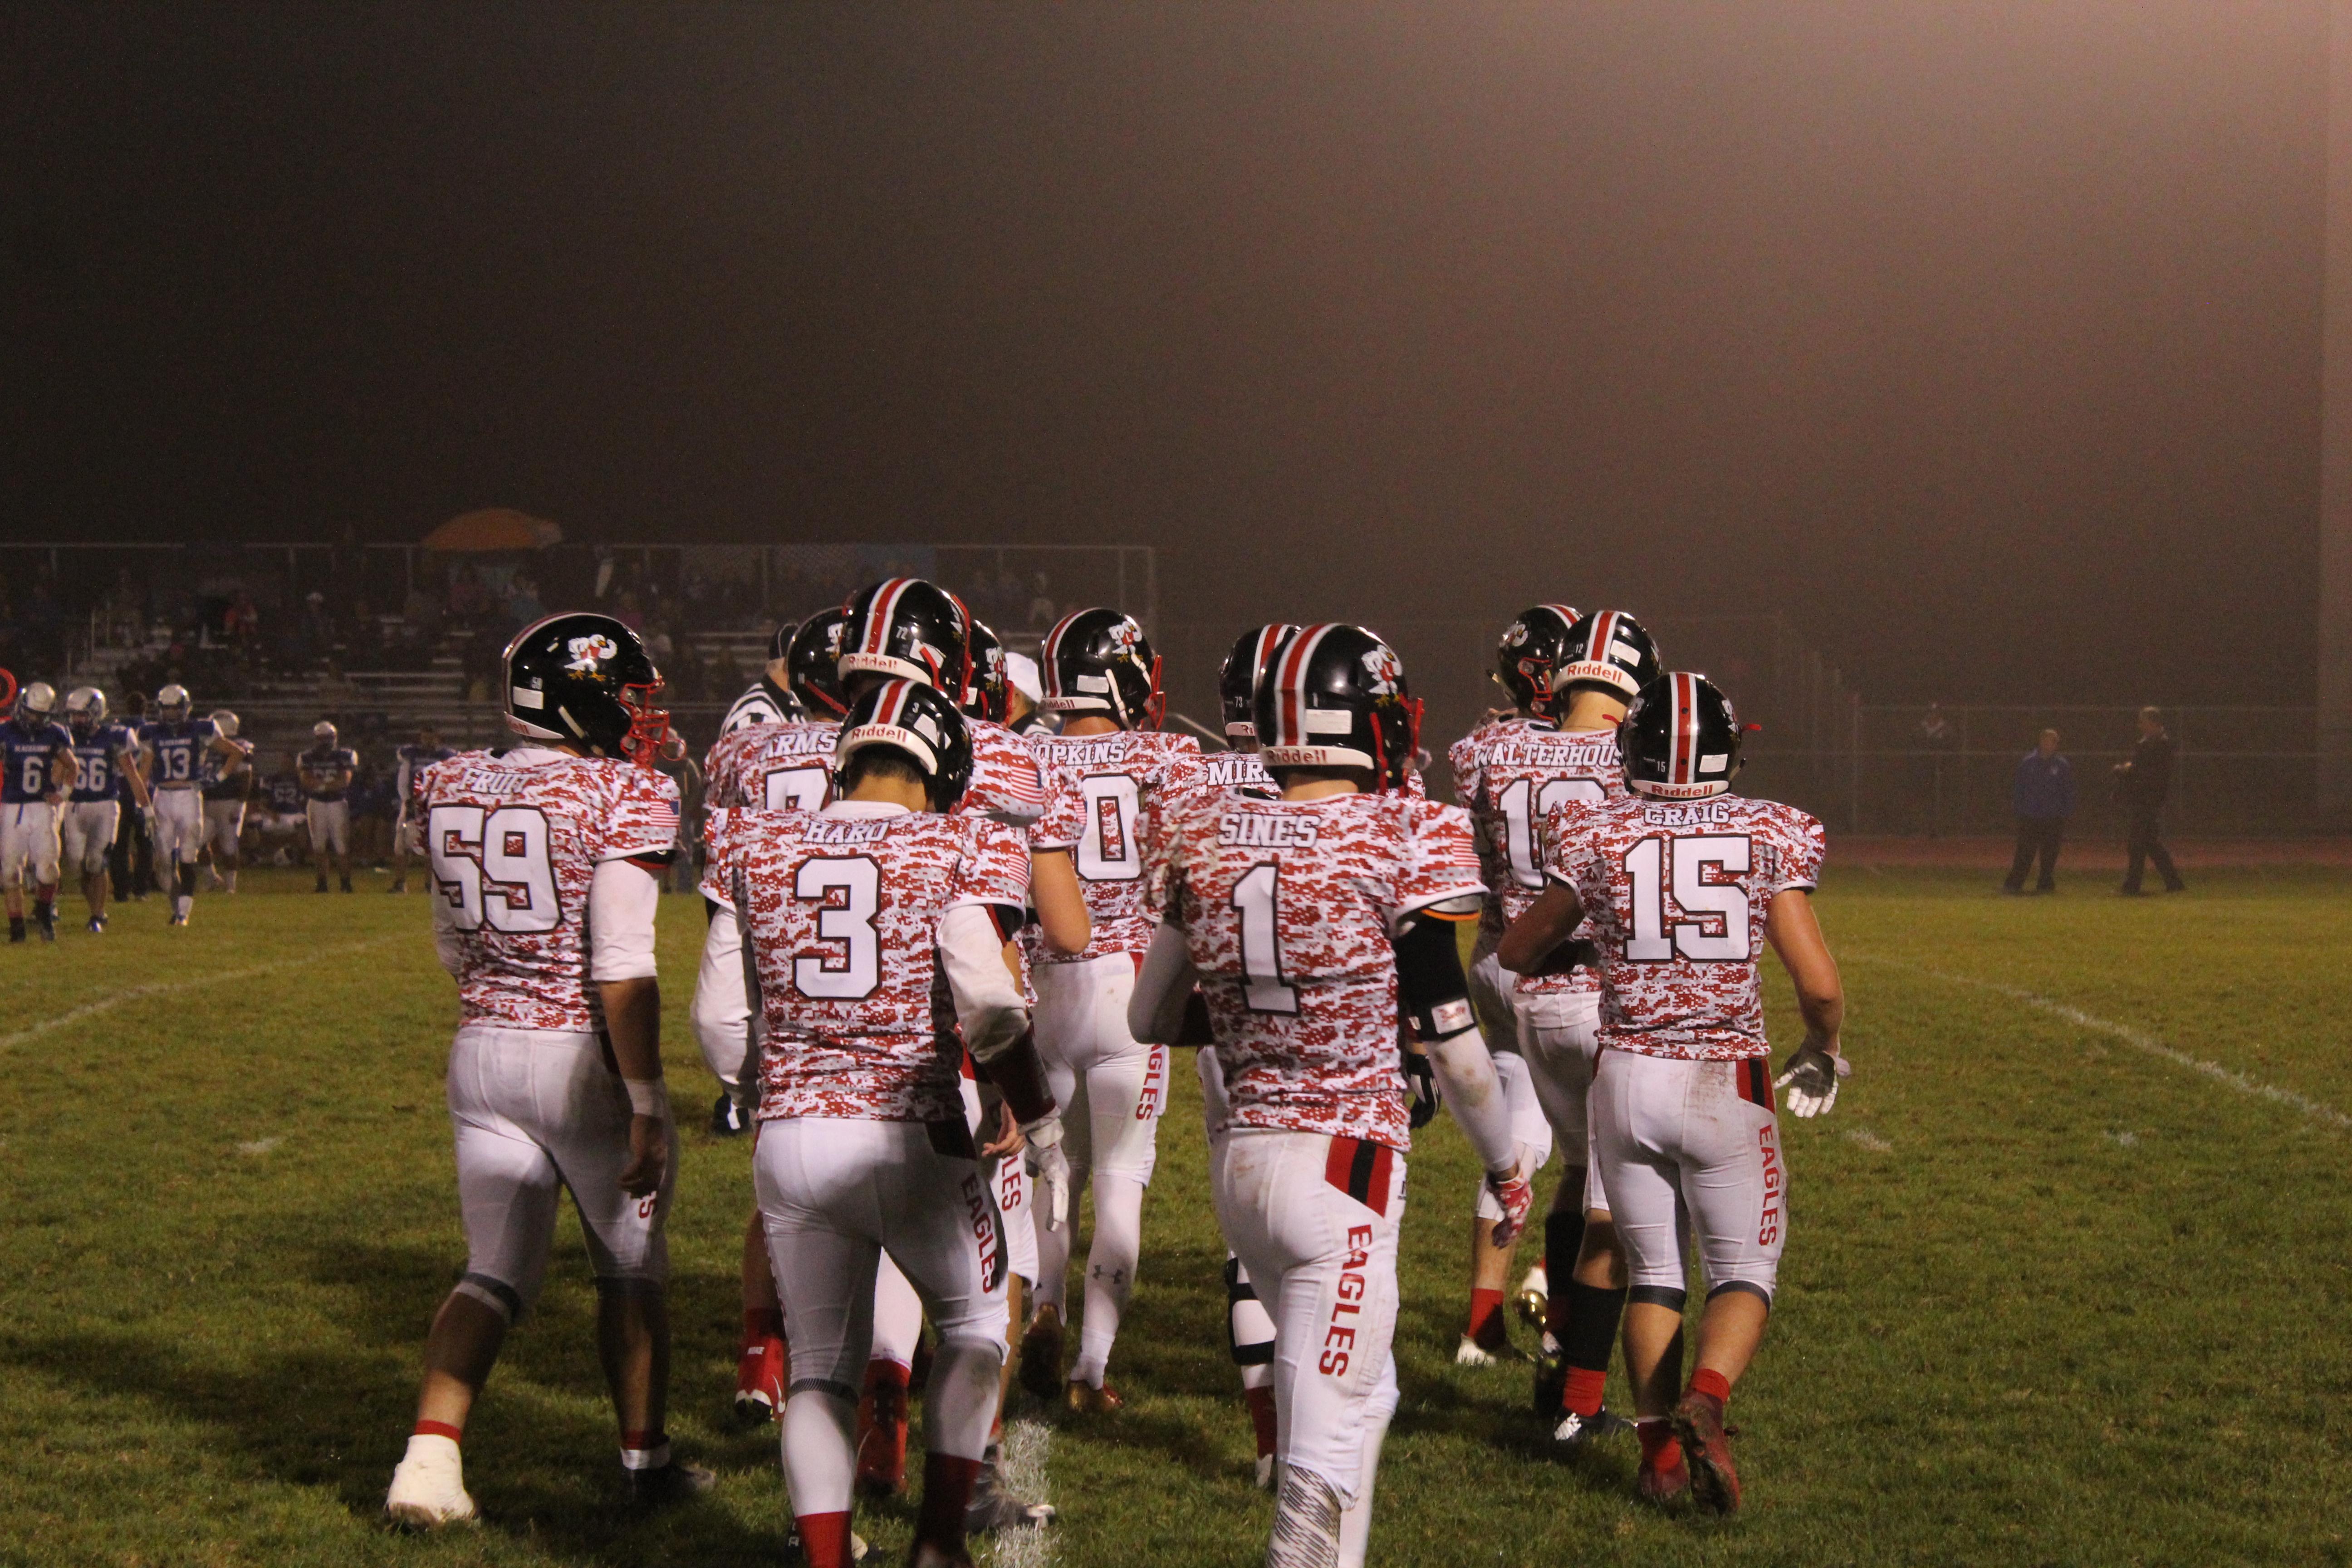 Football team walking onto a football field